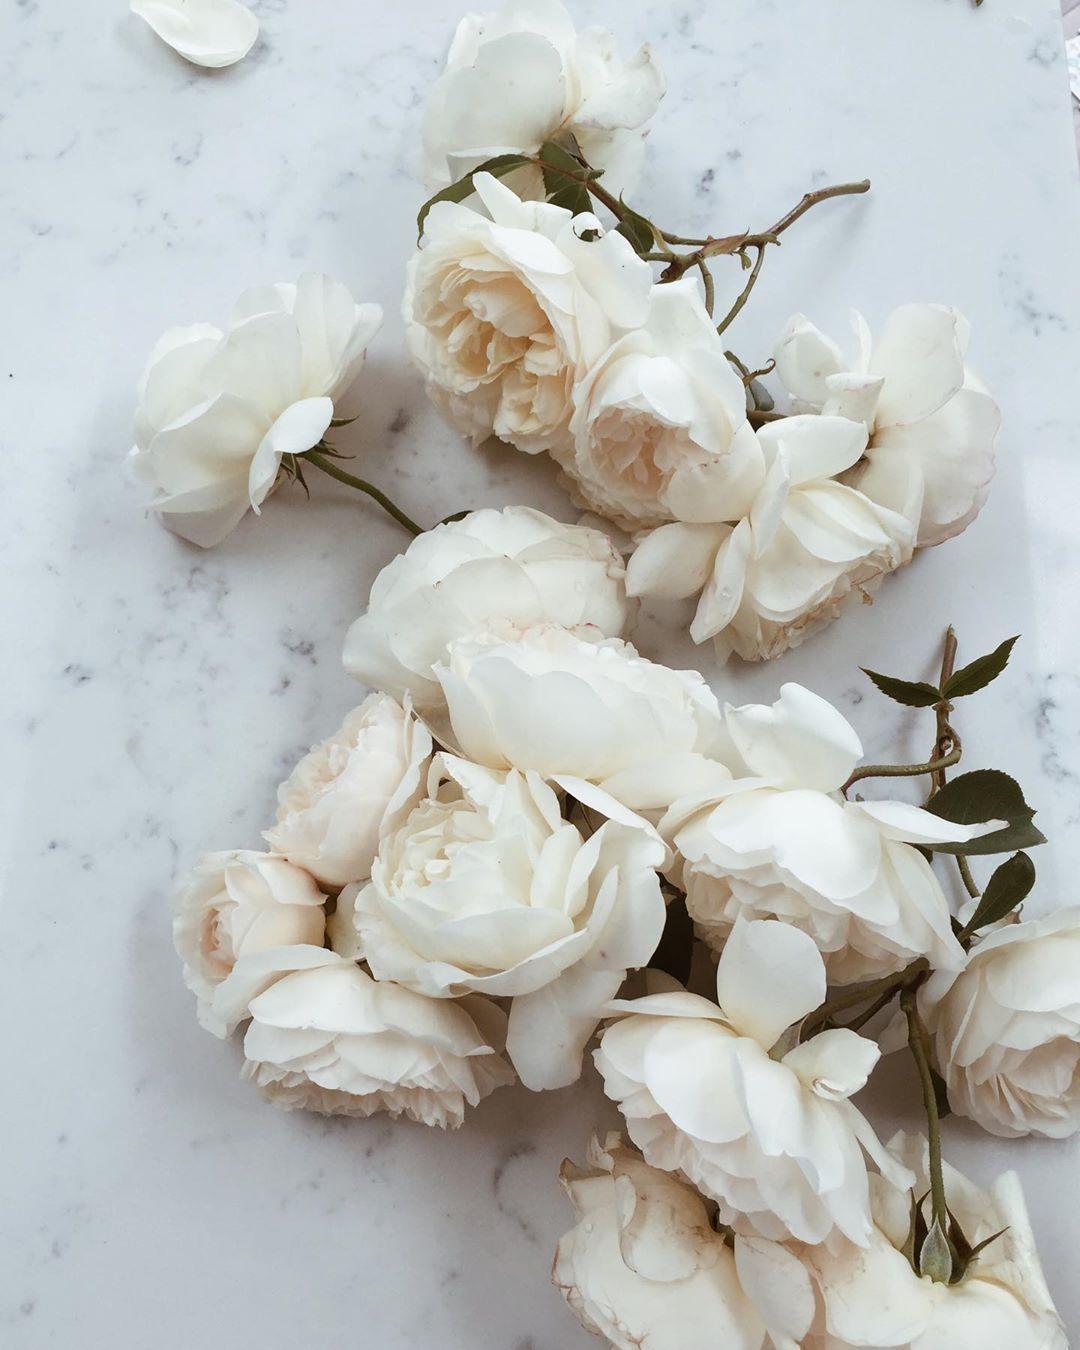 "Amanda Woodward-Brown on Instagram: ""English summer.  #FromTheGarden #Roses #Beauty #SummerInEngland #FlowerAddict #FreshlyPicked #Flora"""